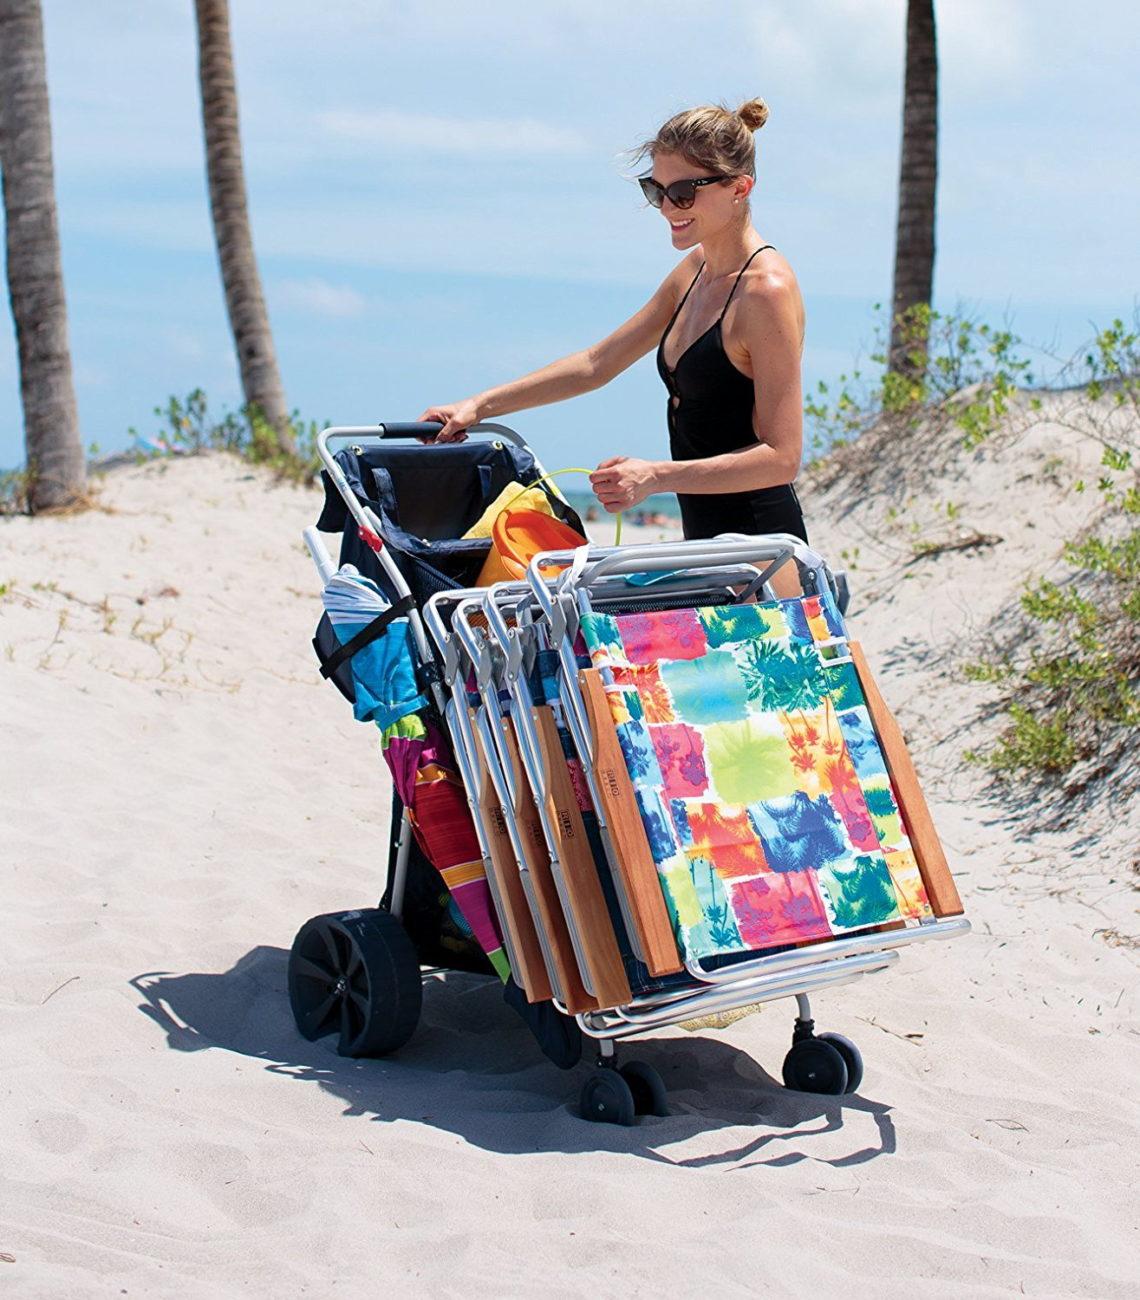 Dune buggy on 30s dub wheels - YouTube |Big Wheels Beach Buggy